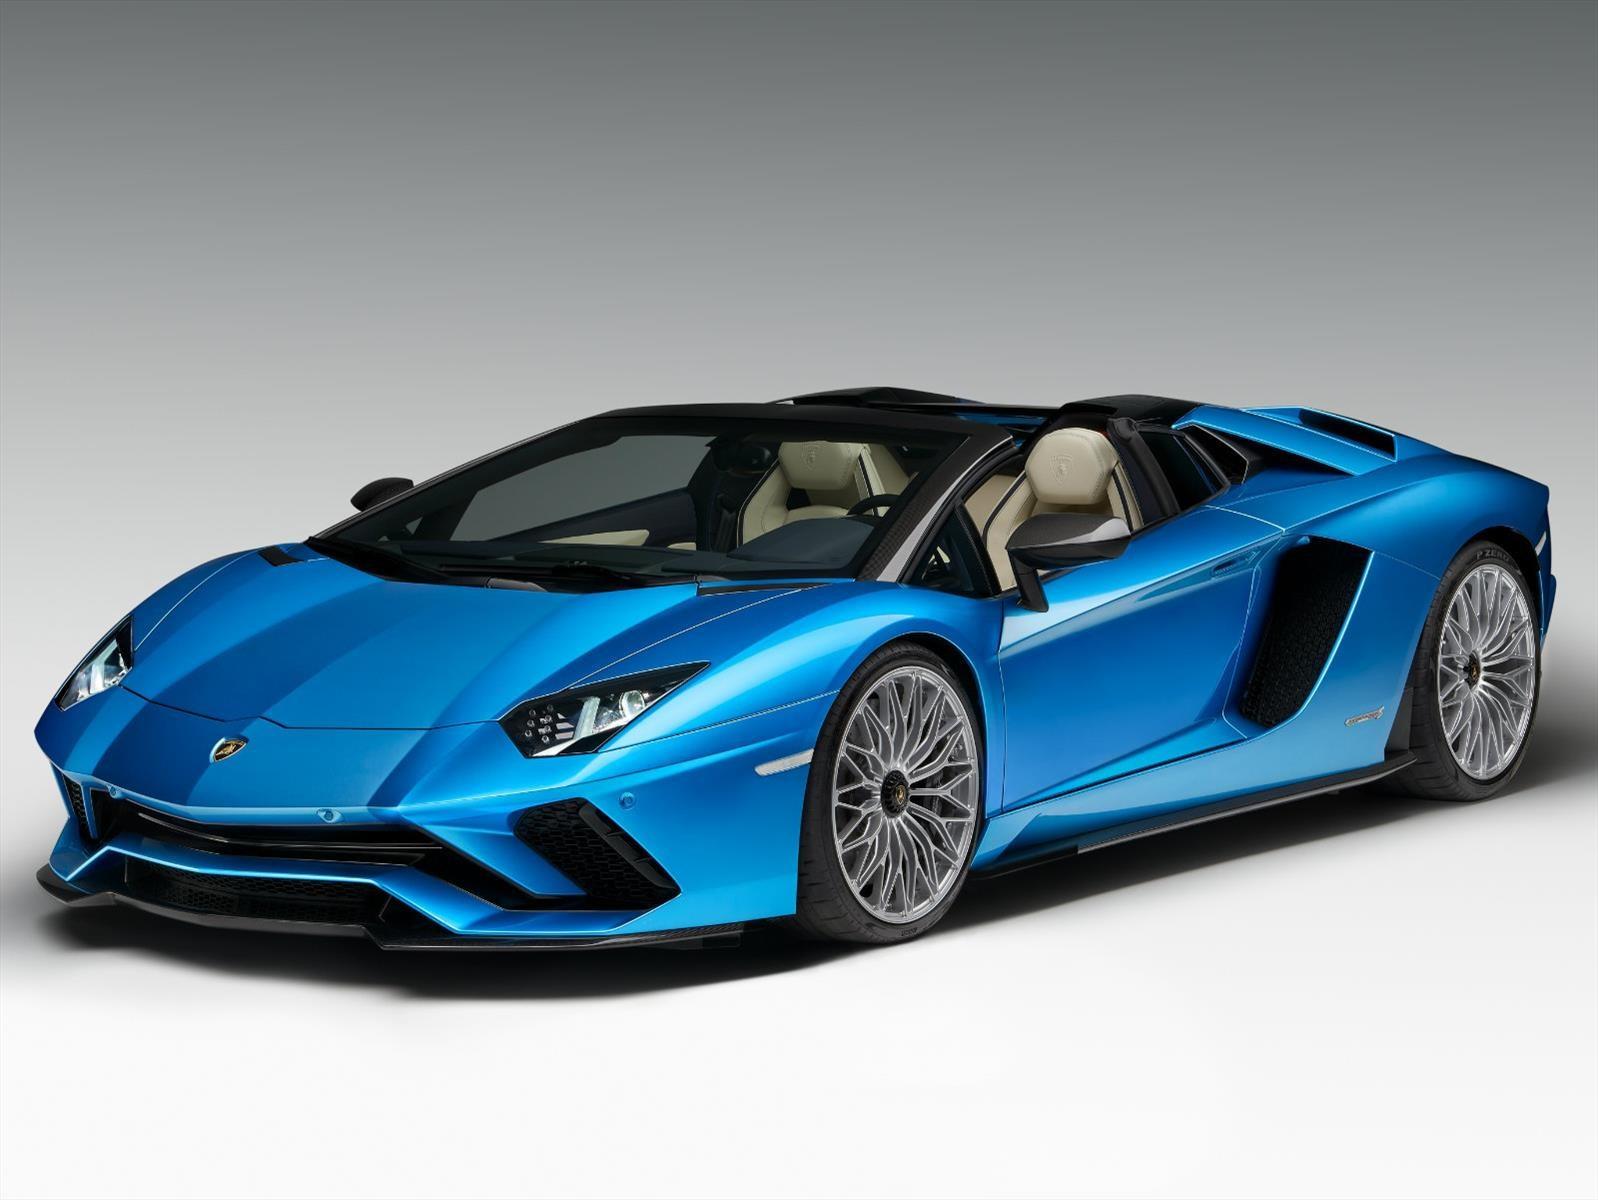 Lamborghini Aventador S Roadster, diversión a cielo abierto